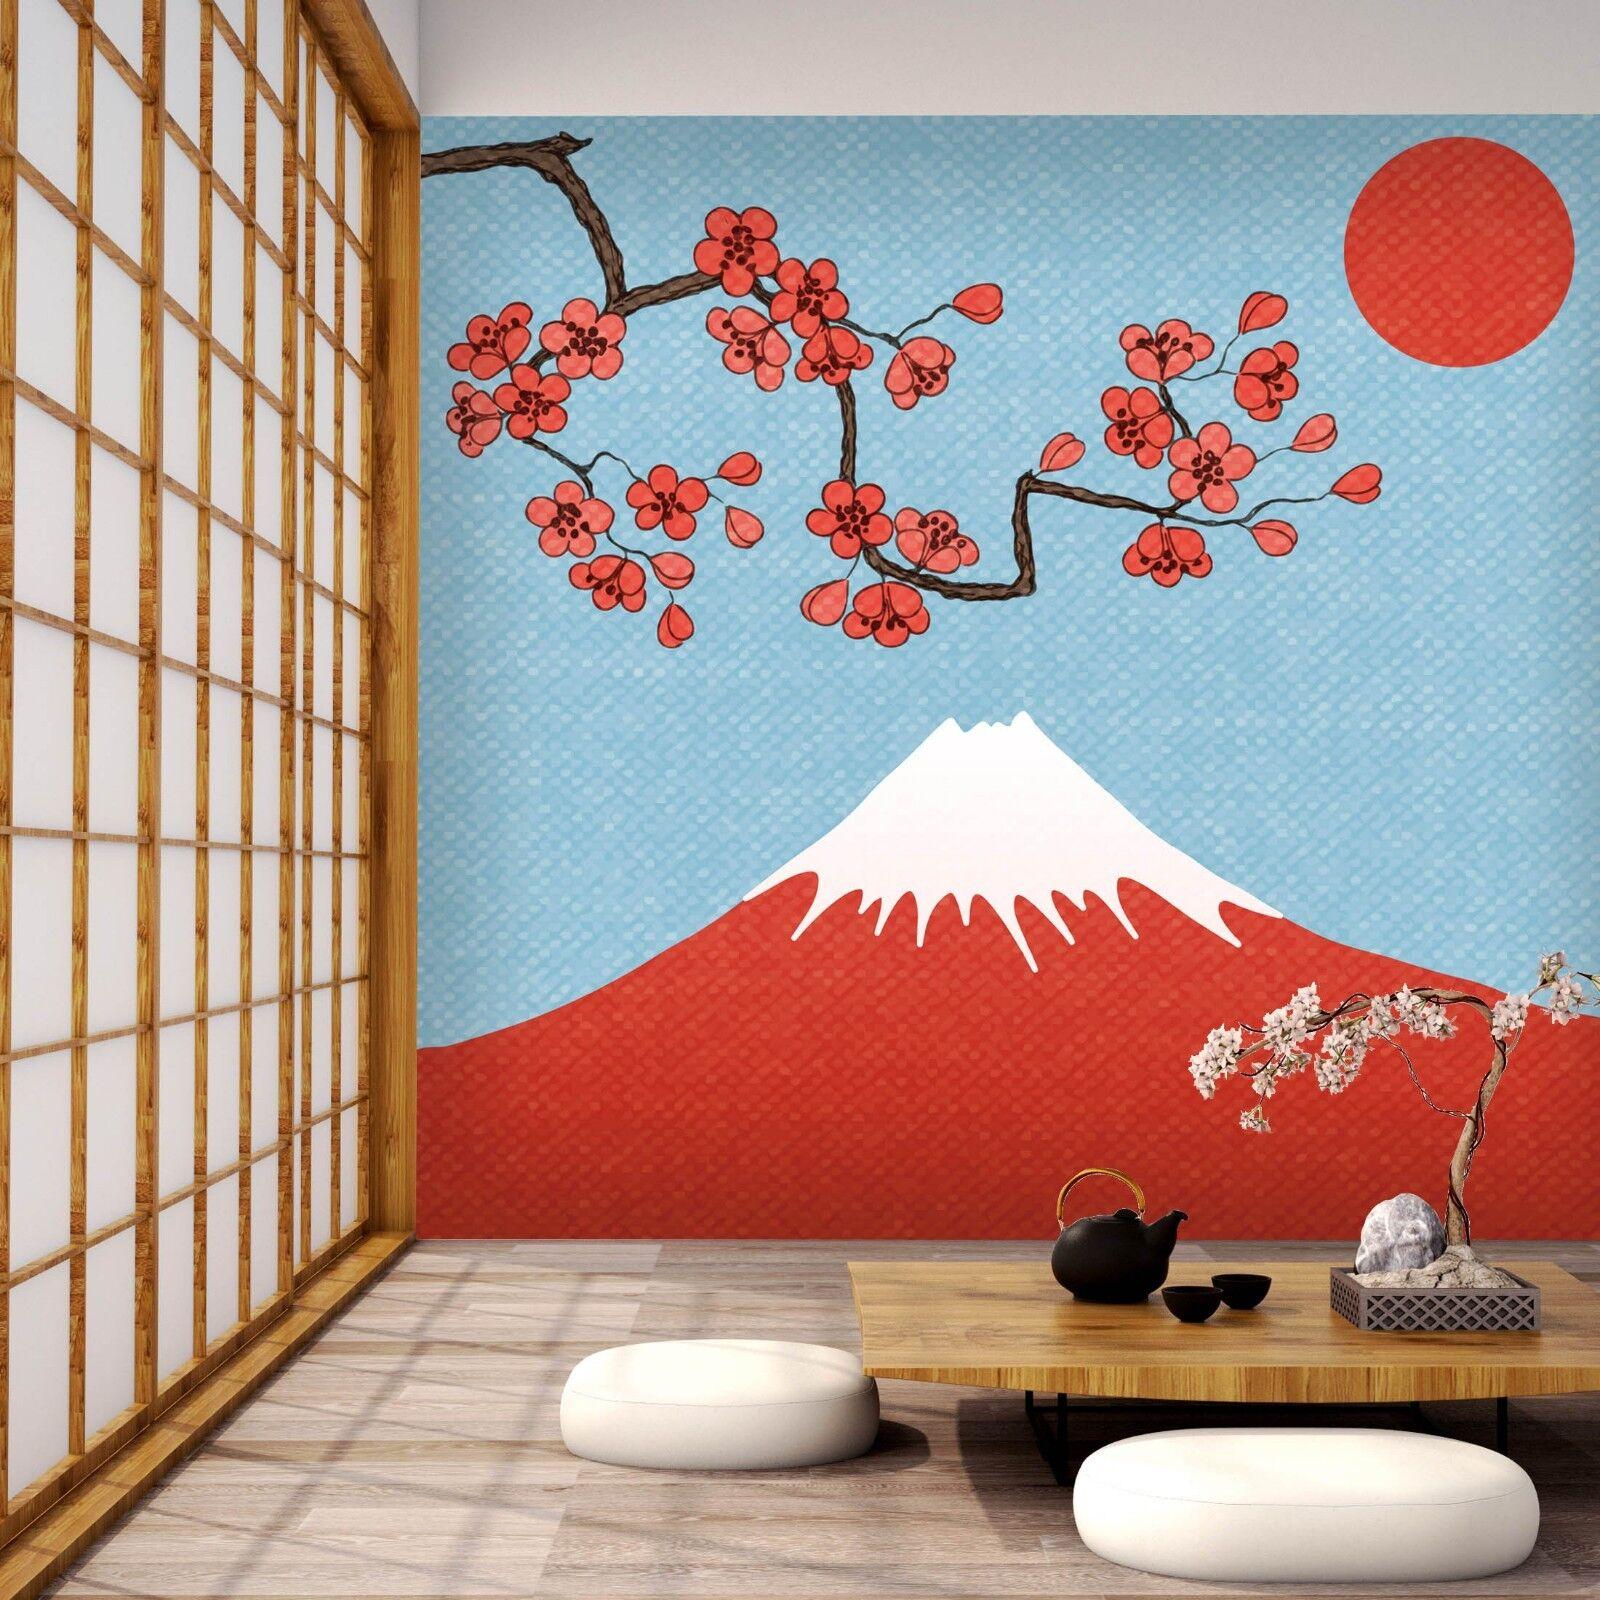 3D Mount Fuji Sun Flowers 4 Wall Paper Wall Print Decal Wall Deco Indoor Murals